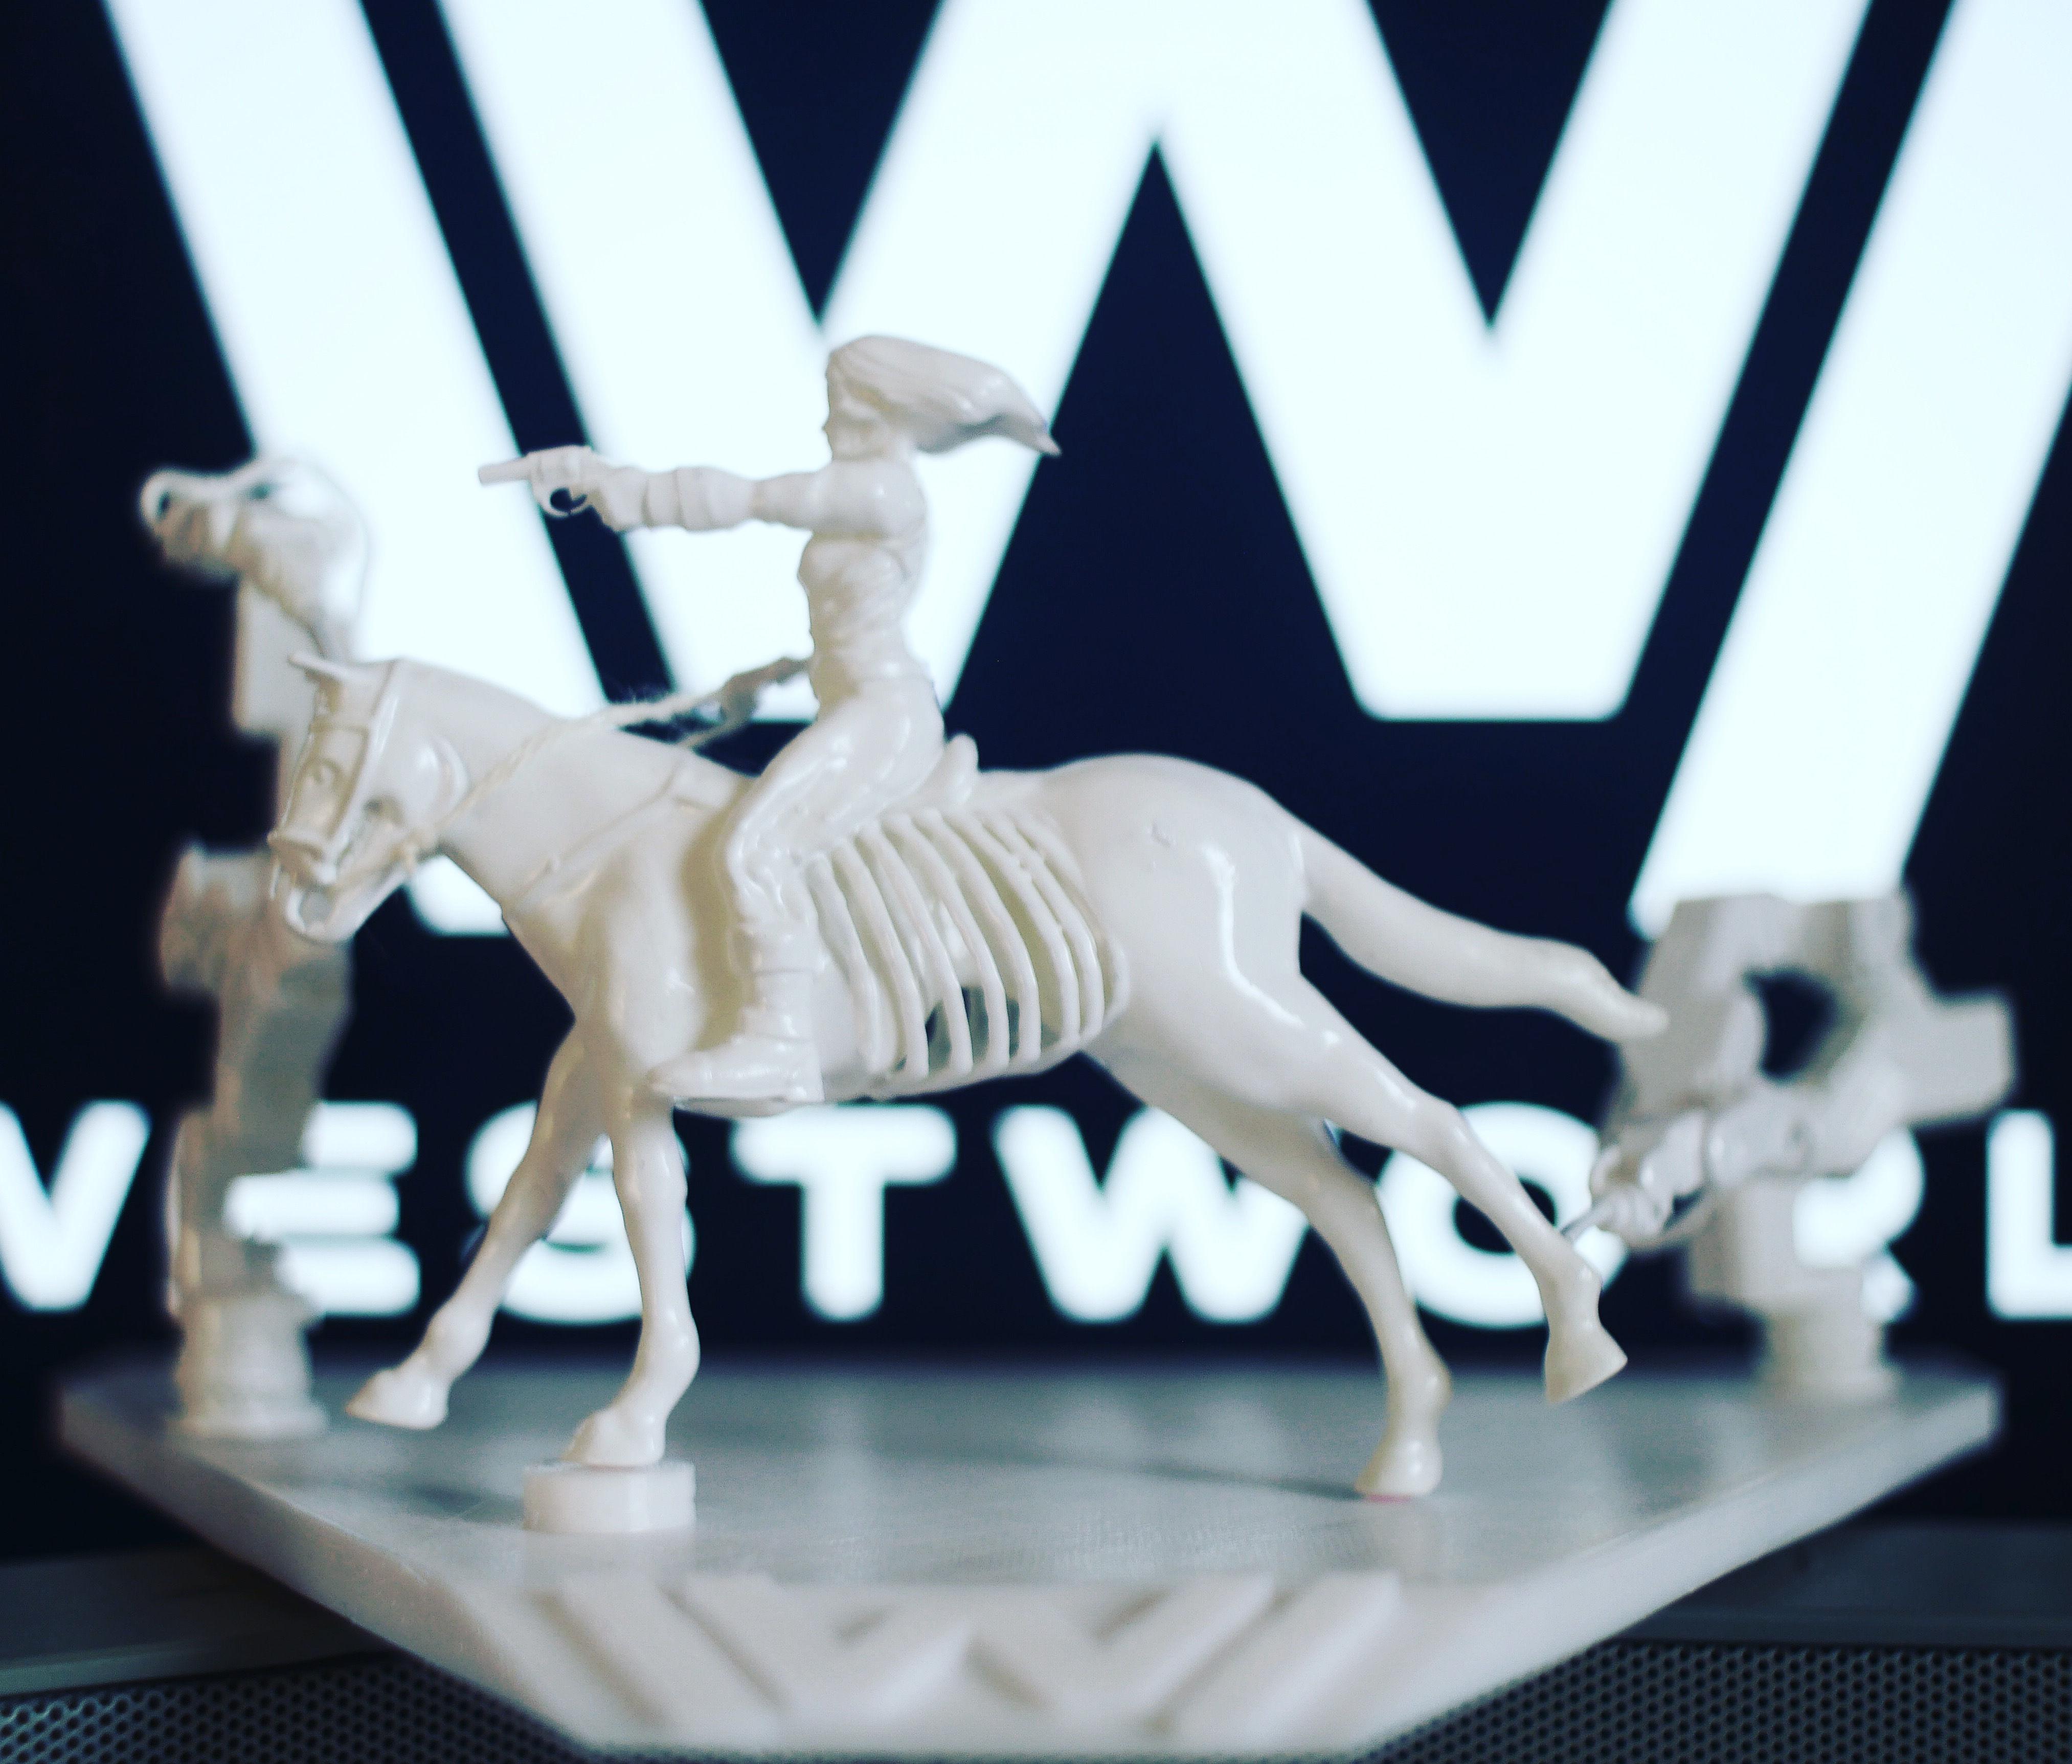 WestWorld diorama - woman riding horse with gun